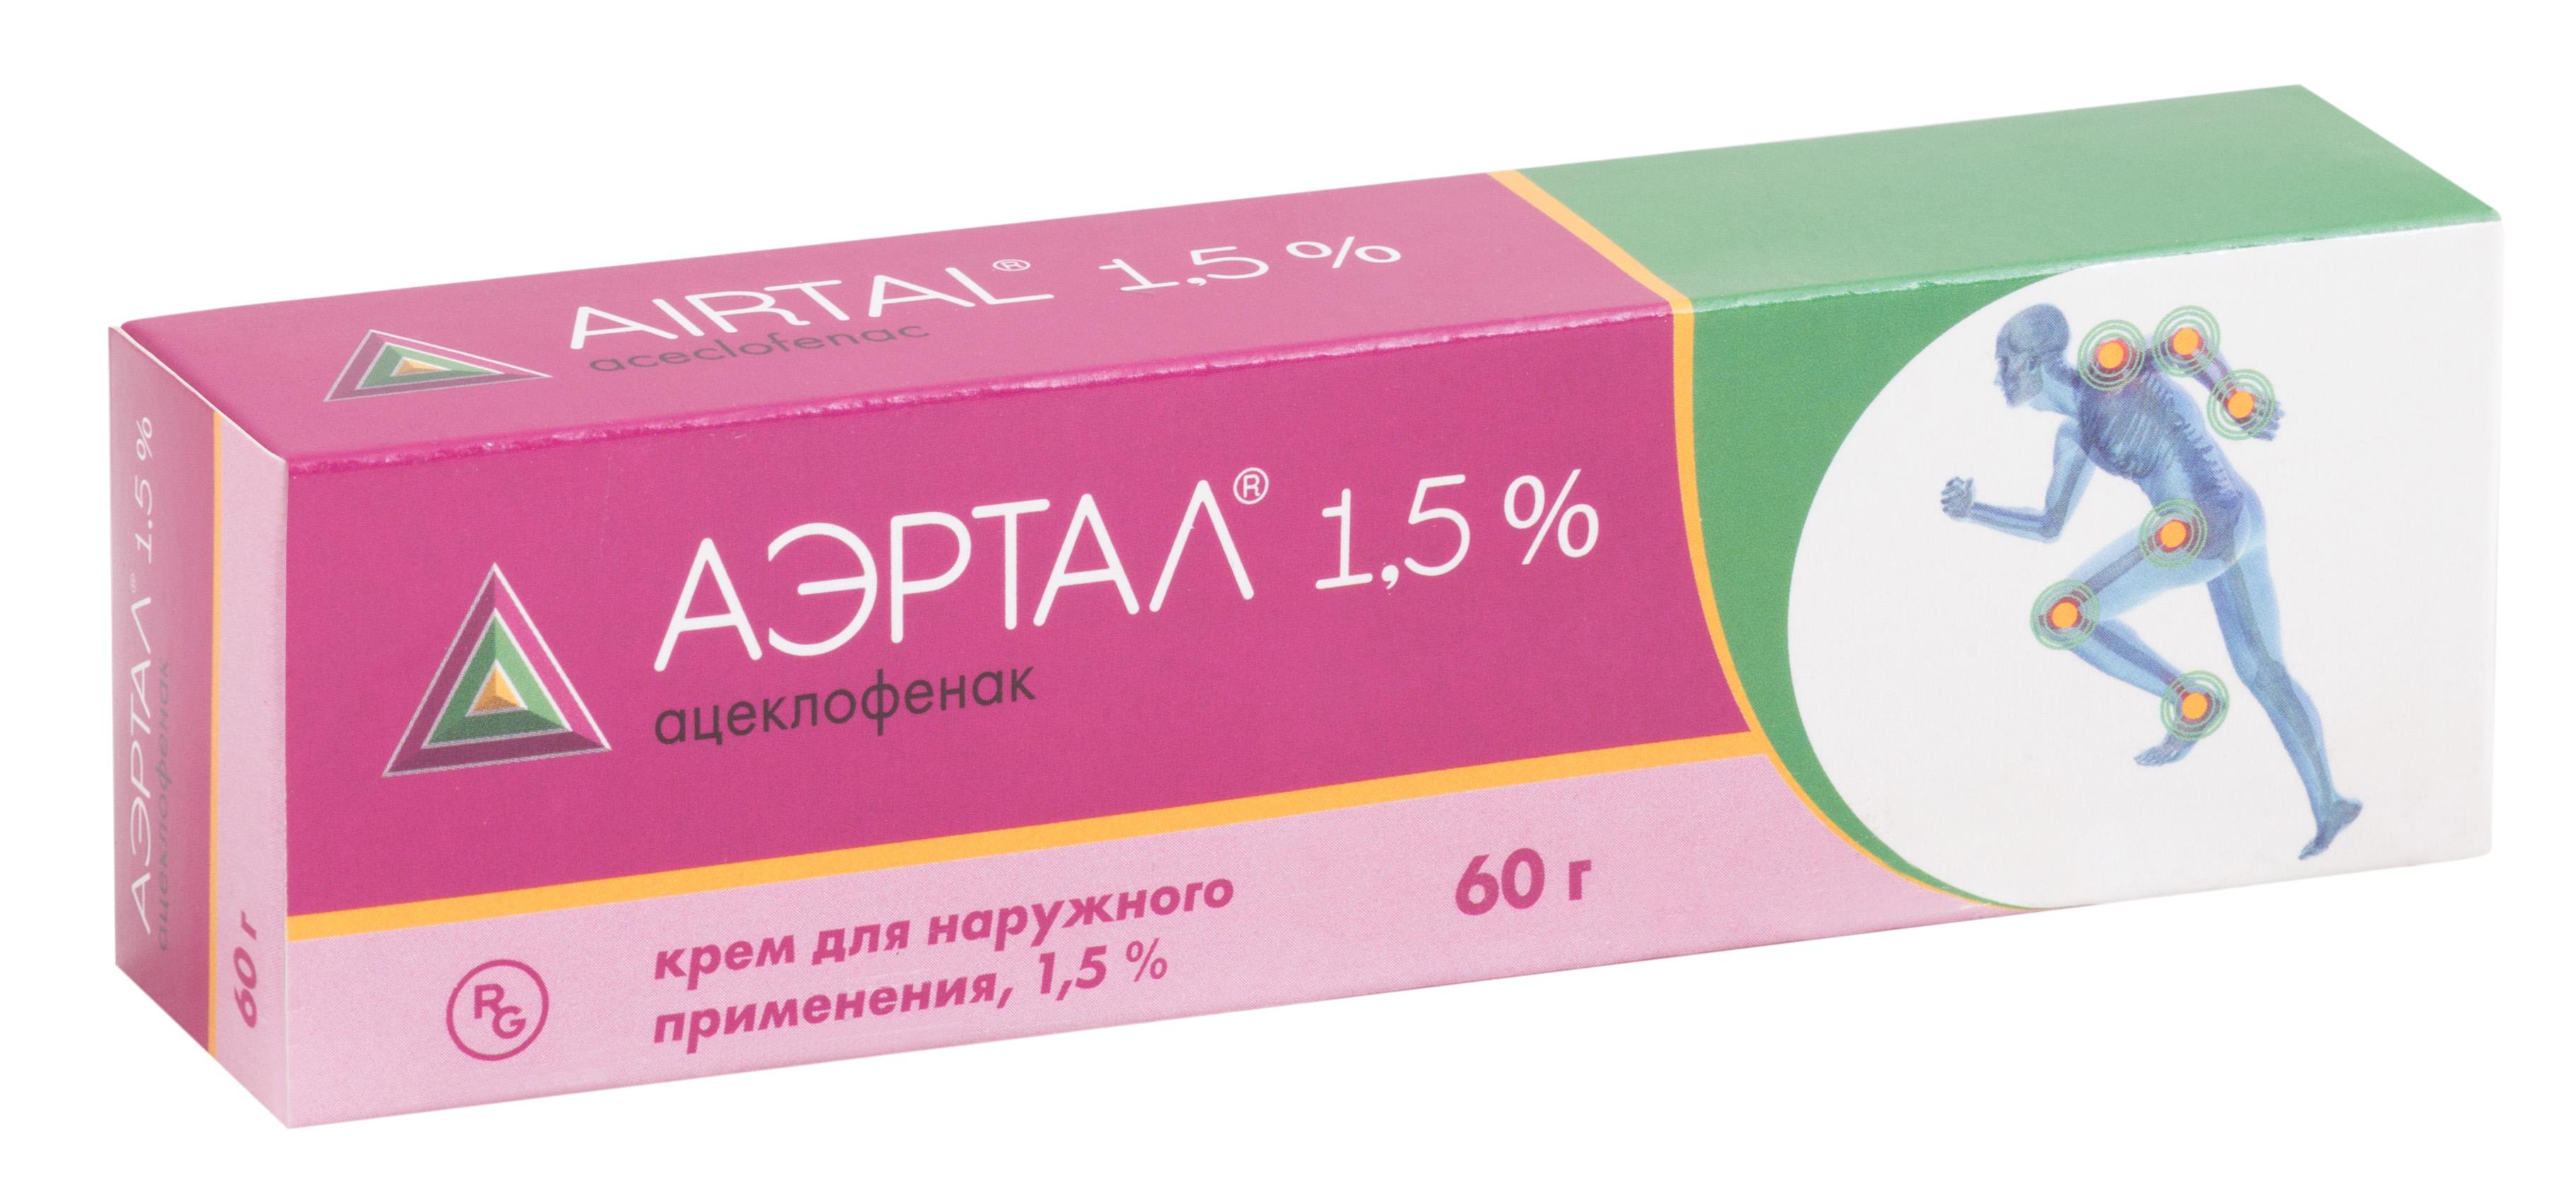 Аэртал крем 1,5% 60г